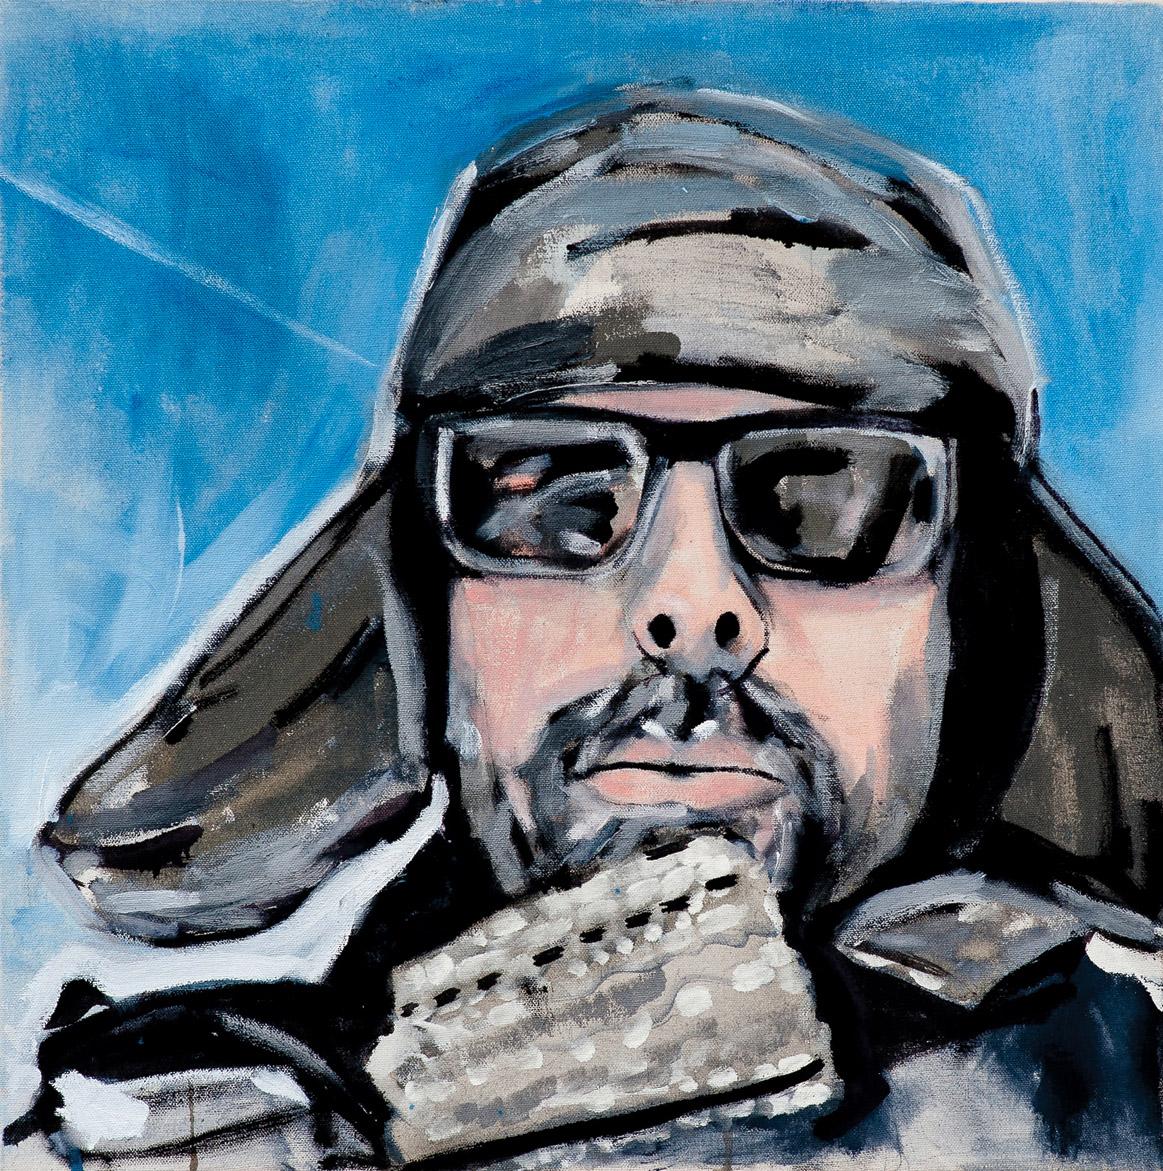 Painting of David Seymour by Melanie Janisse-Barlow